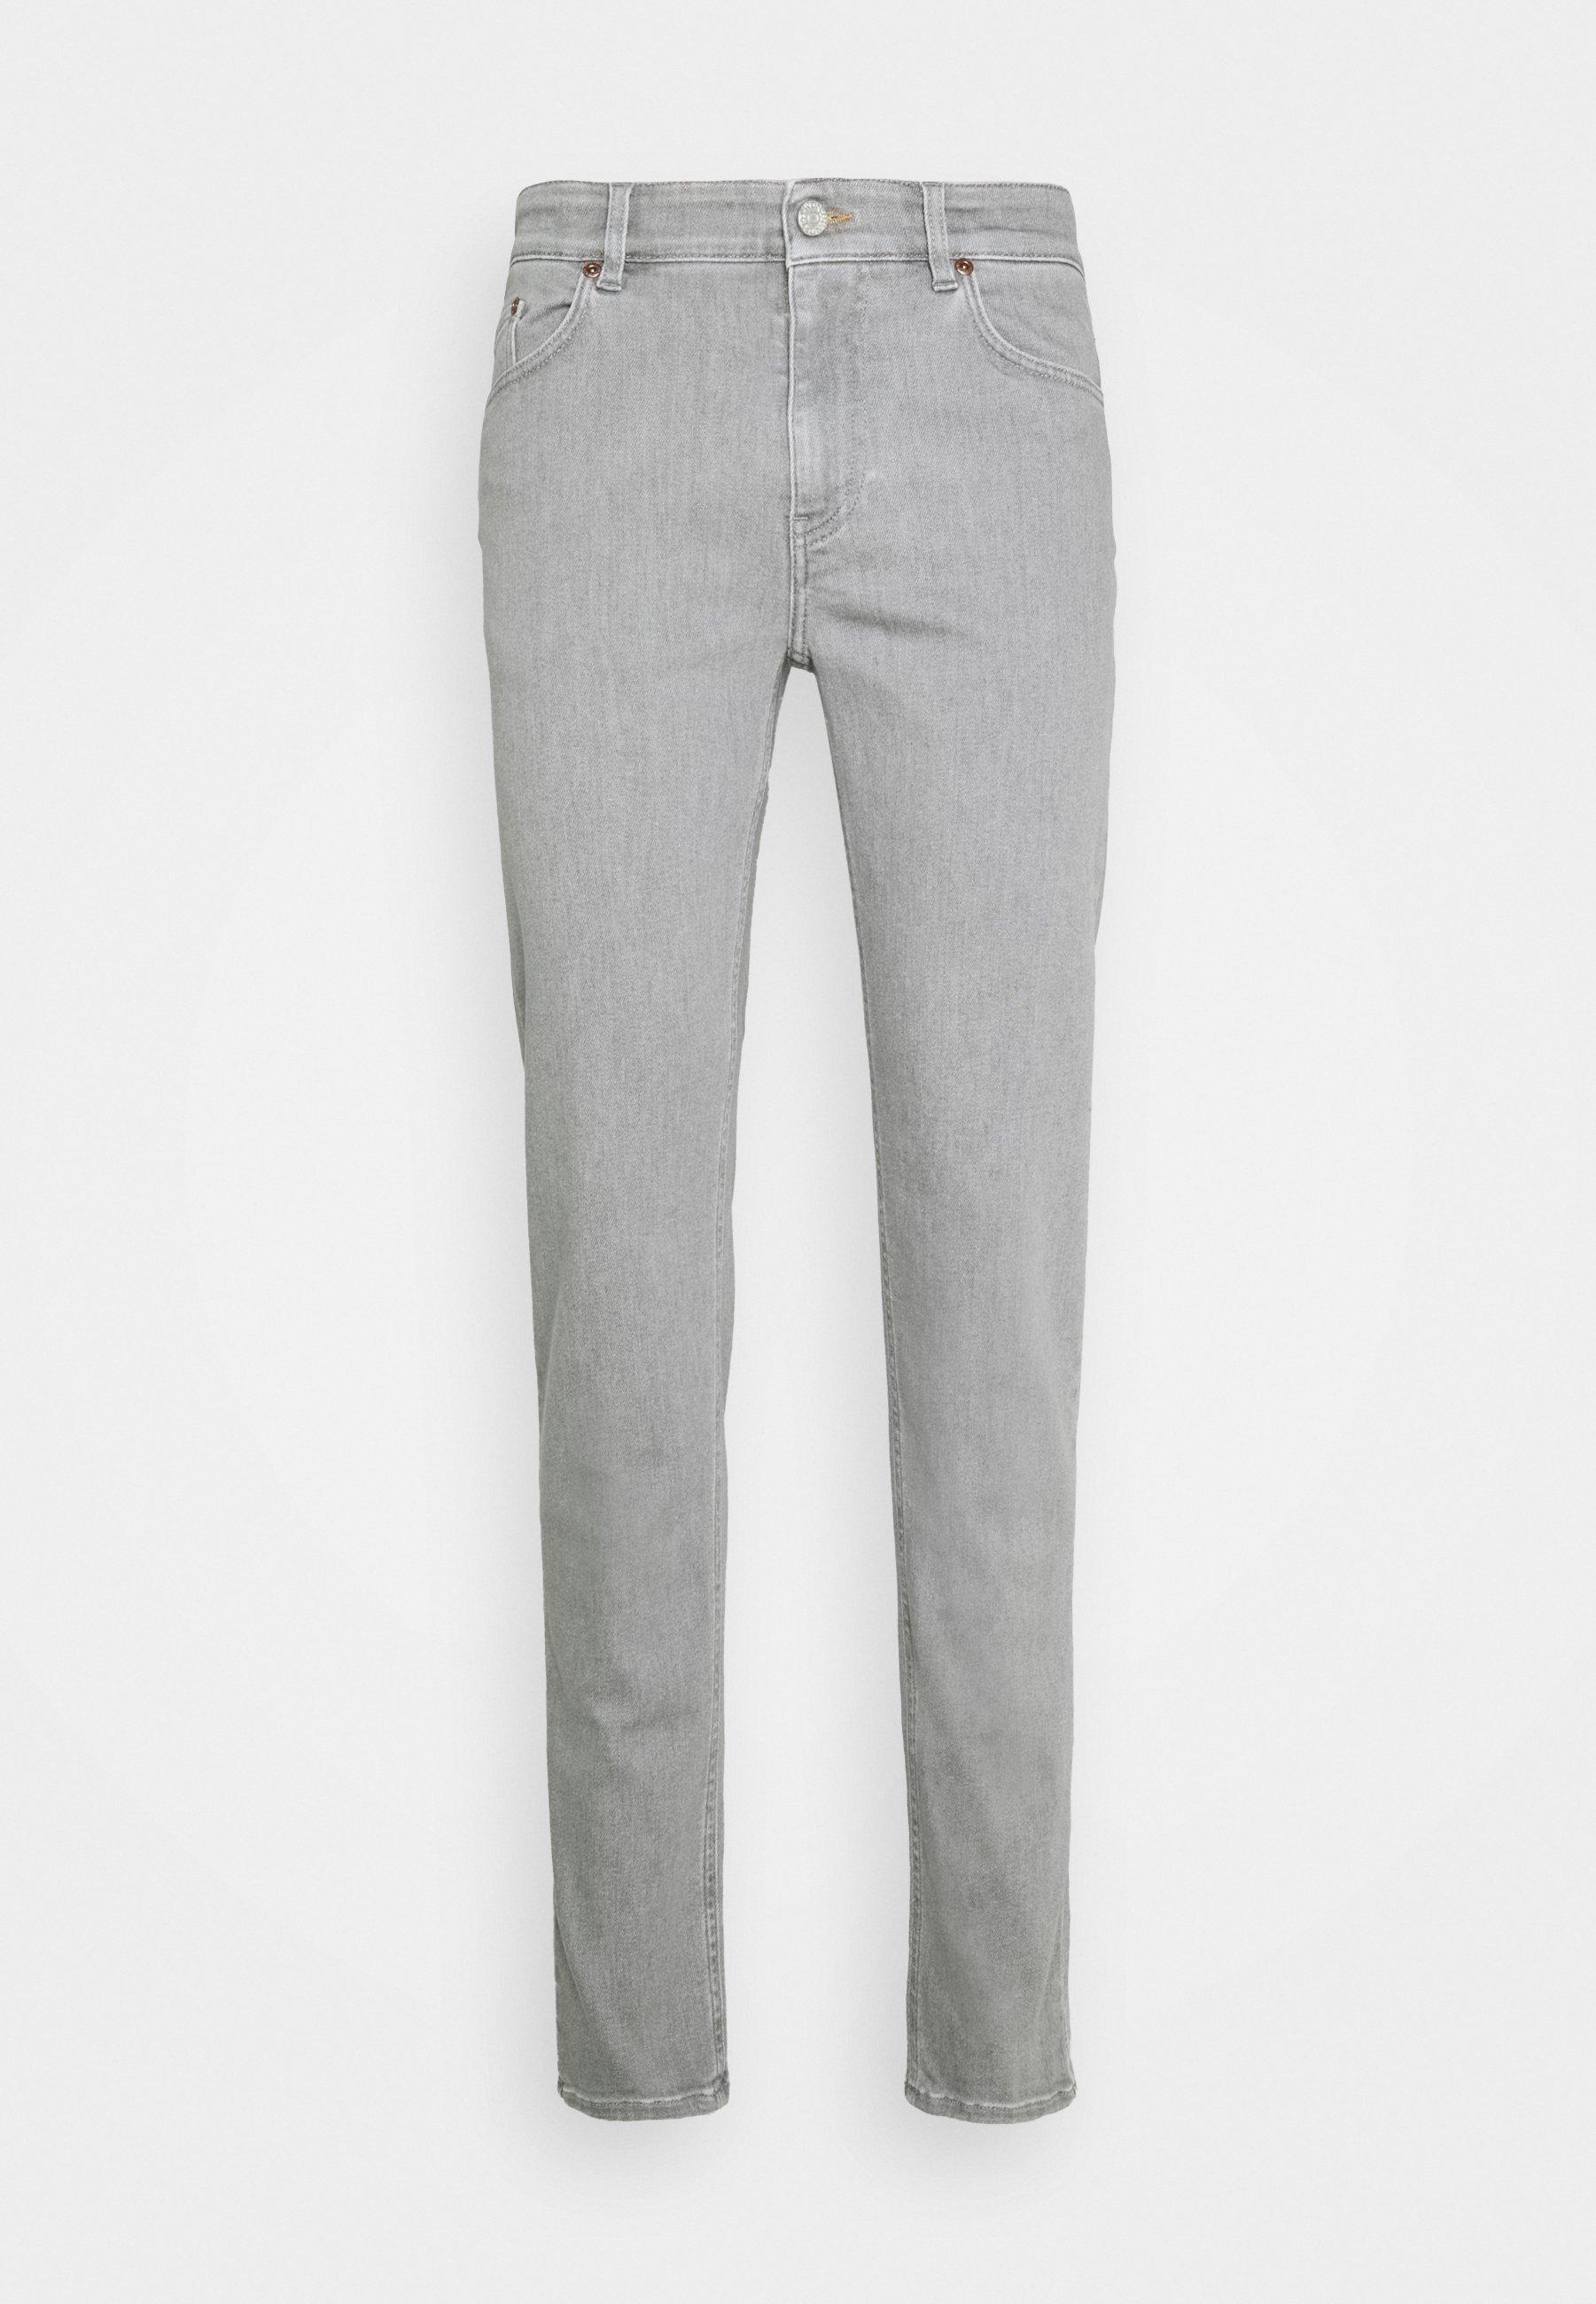 Uomo DEAN - Jeans slim fit